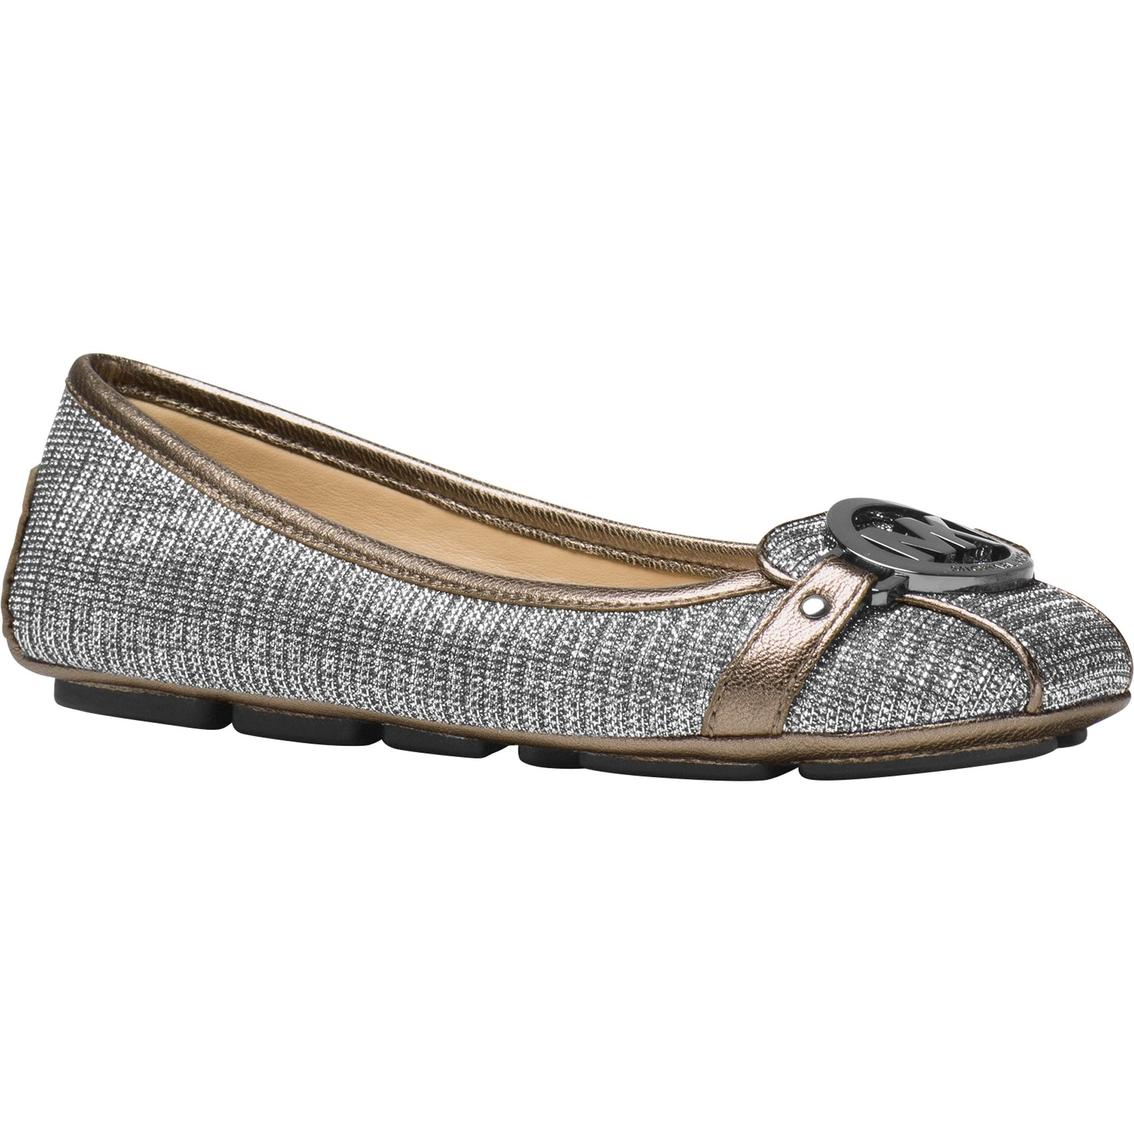 7f19fd64ede31 Michael Kors Glitter Fulton Moccasin Shoes